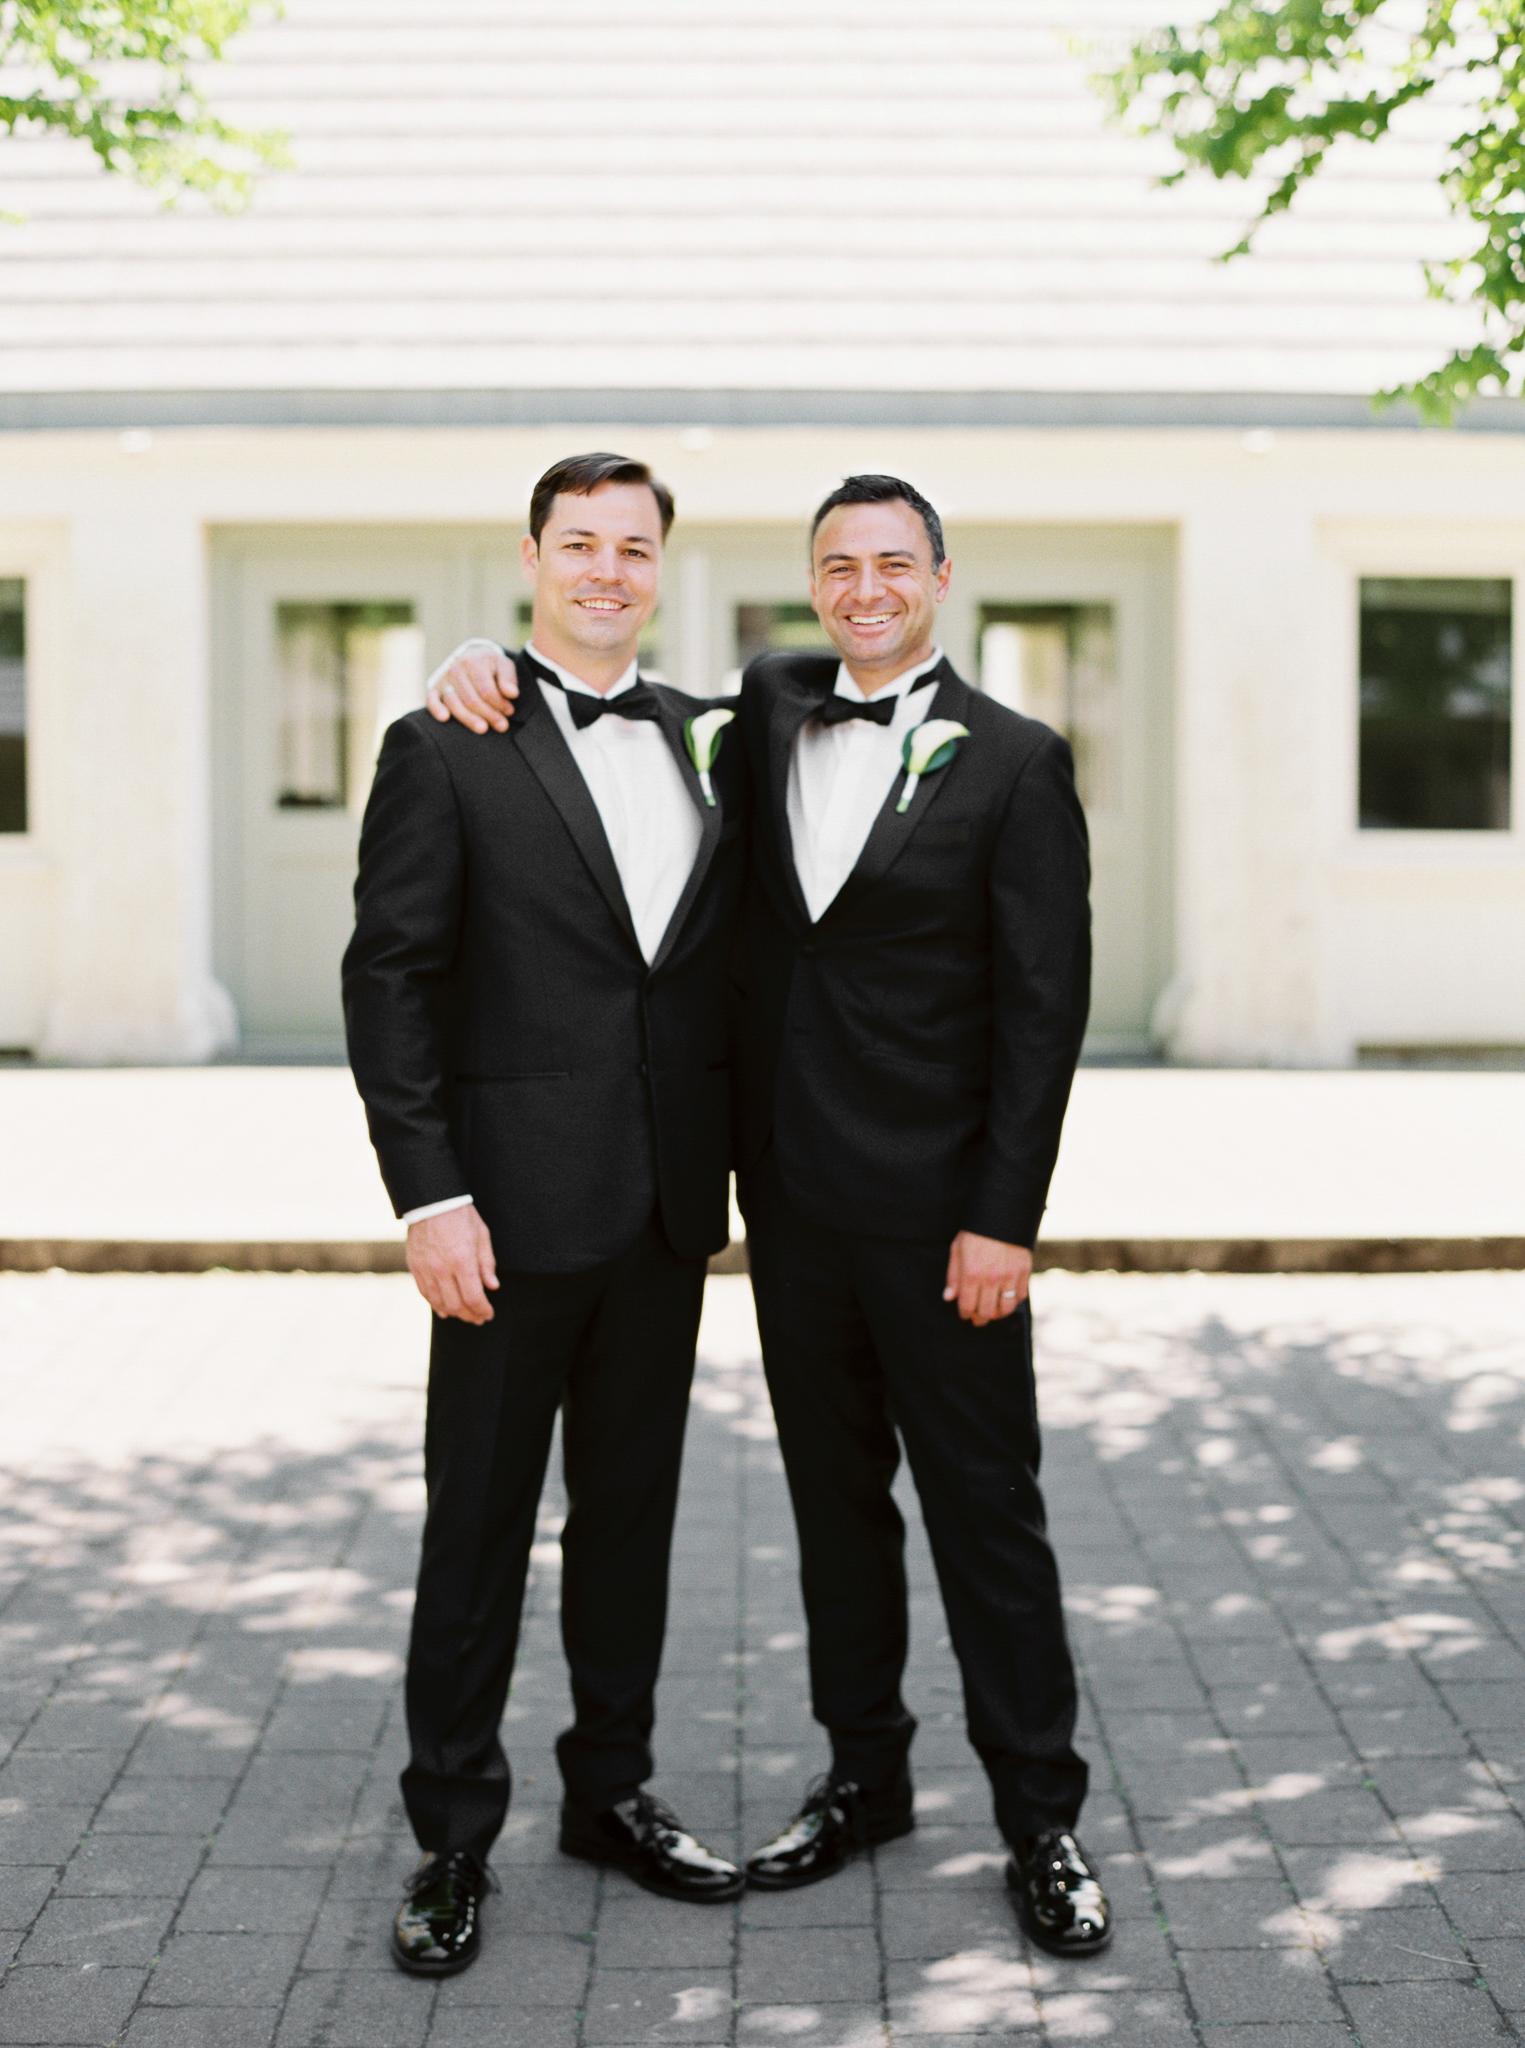 062OutliveCreative_Travel_Photographer_Videographer_Lewis&Clark_Oregon_Elegant_BlackTie_Destination_Wedding.jpg